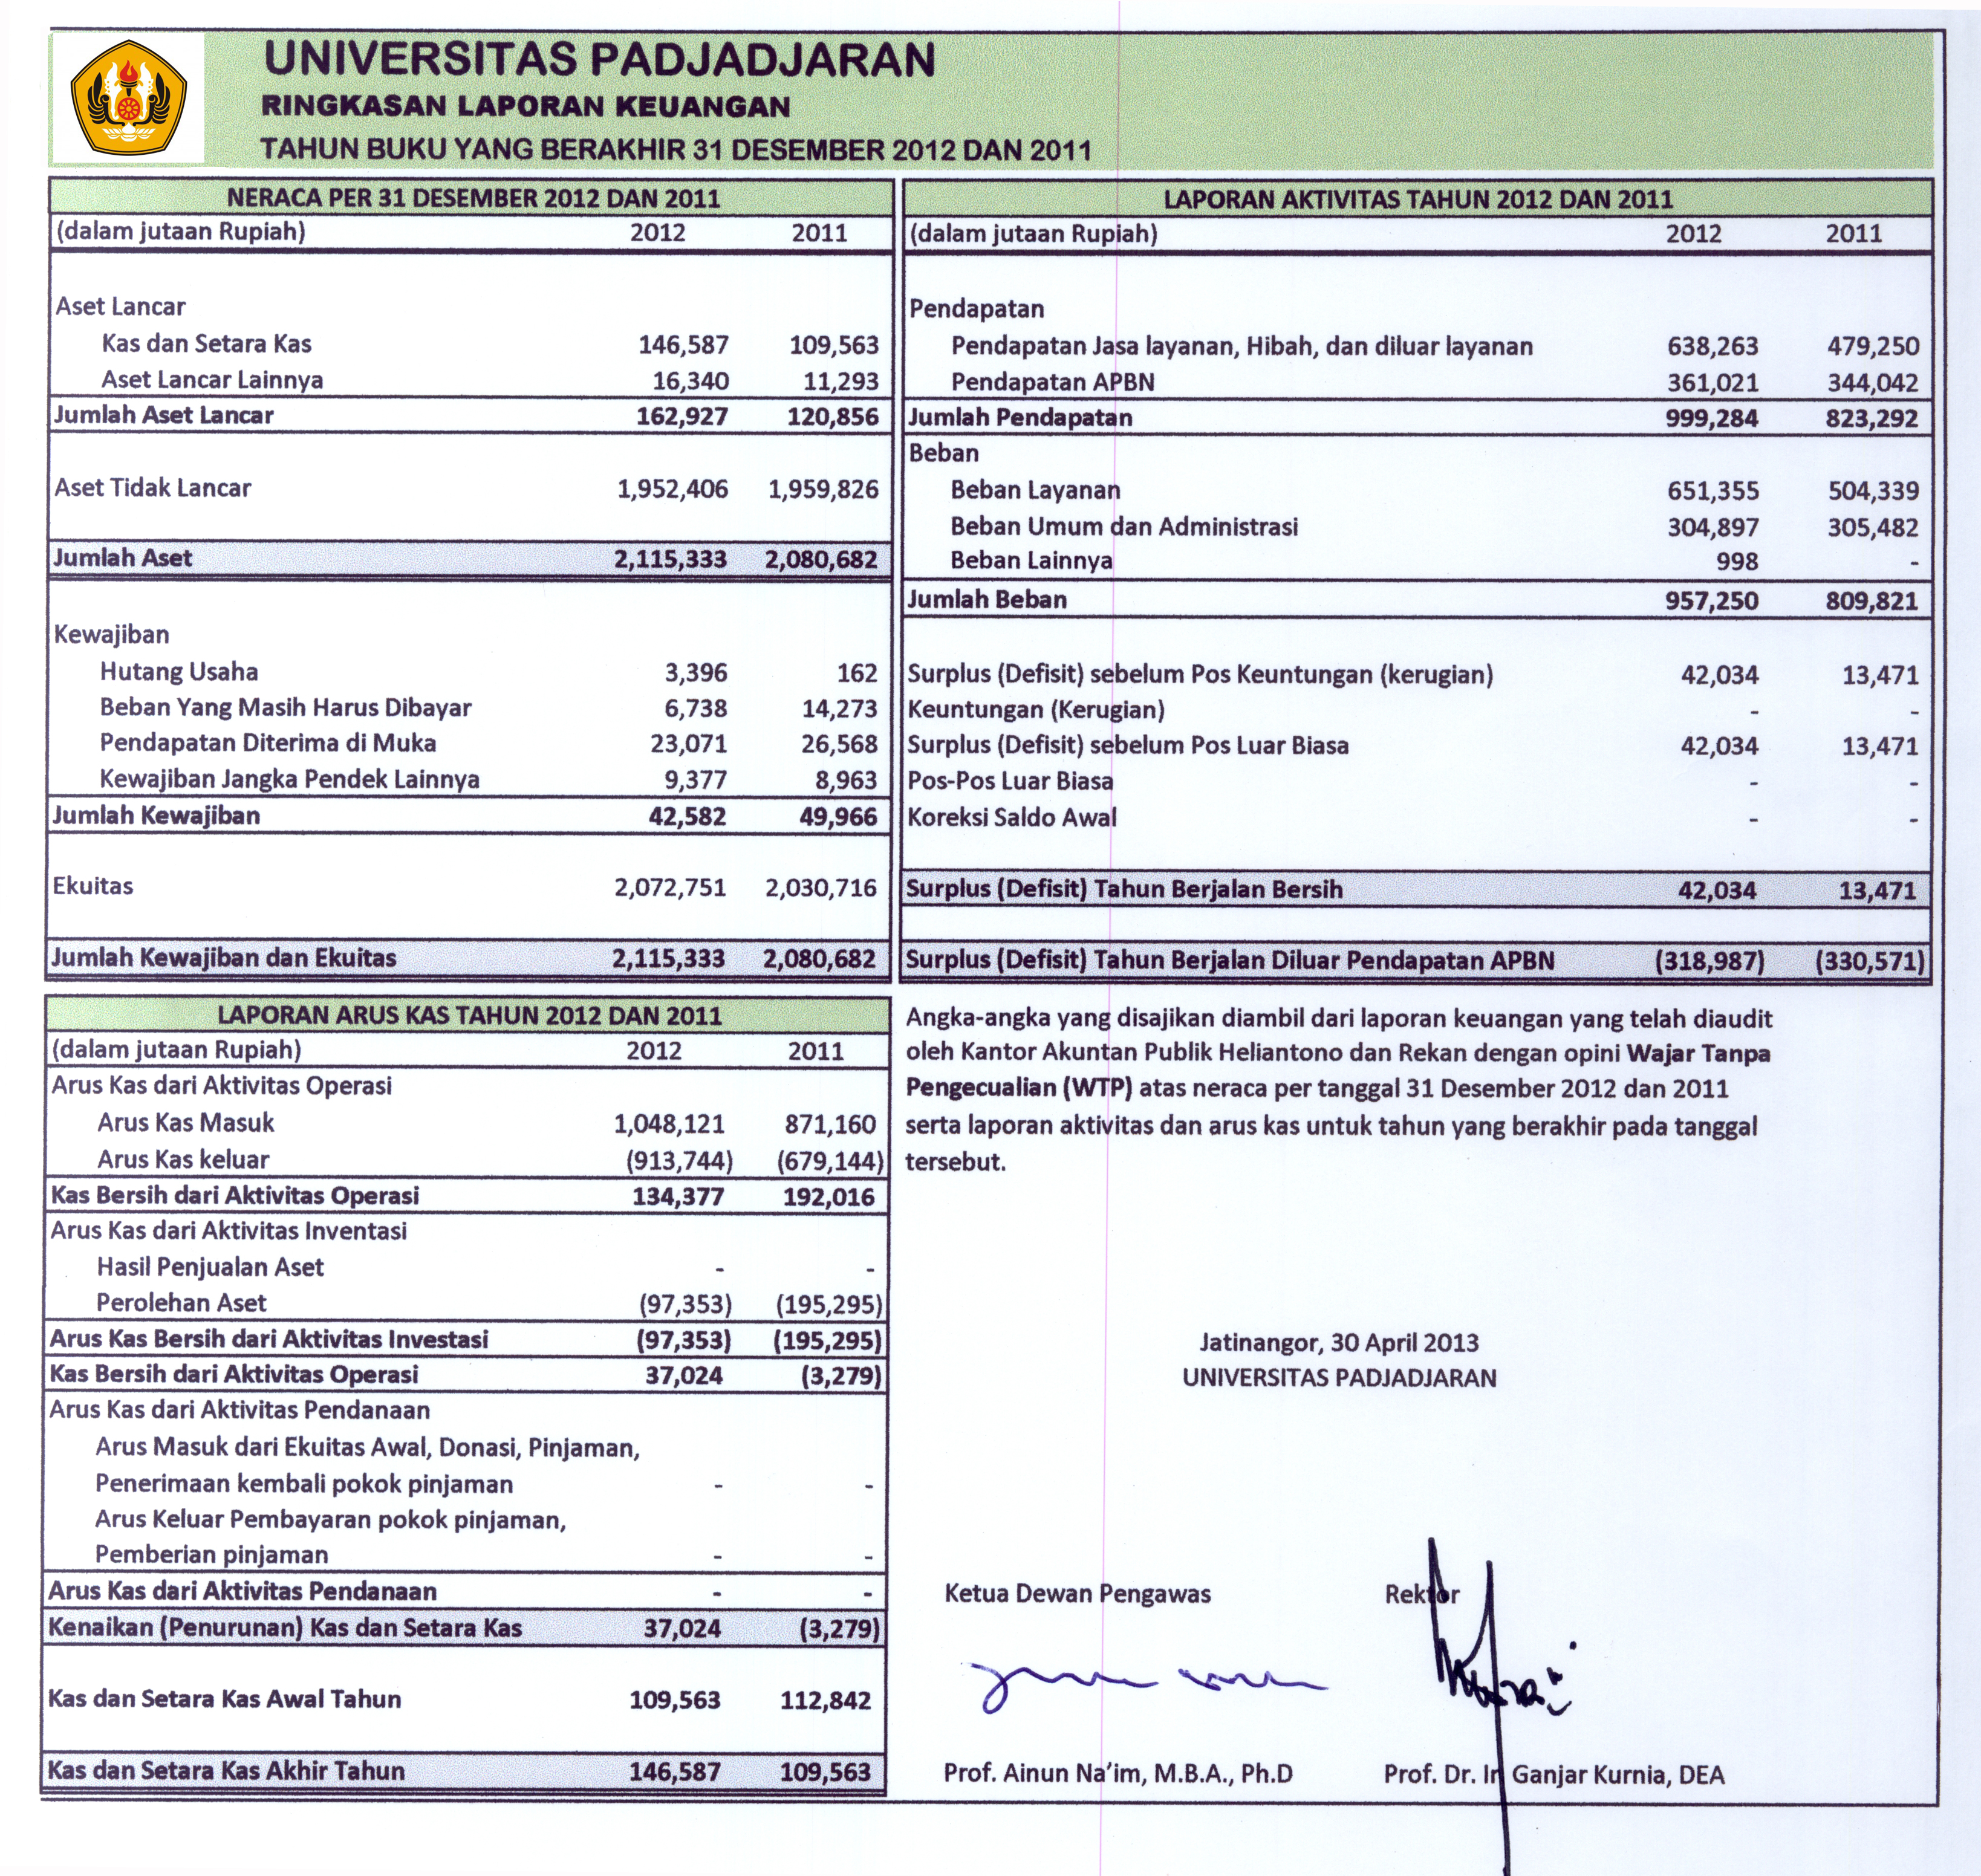 Keuangan Universitas Padjadjaran